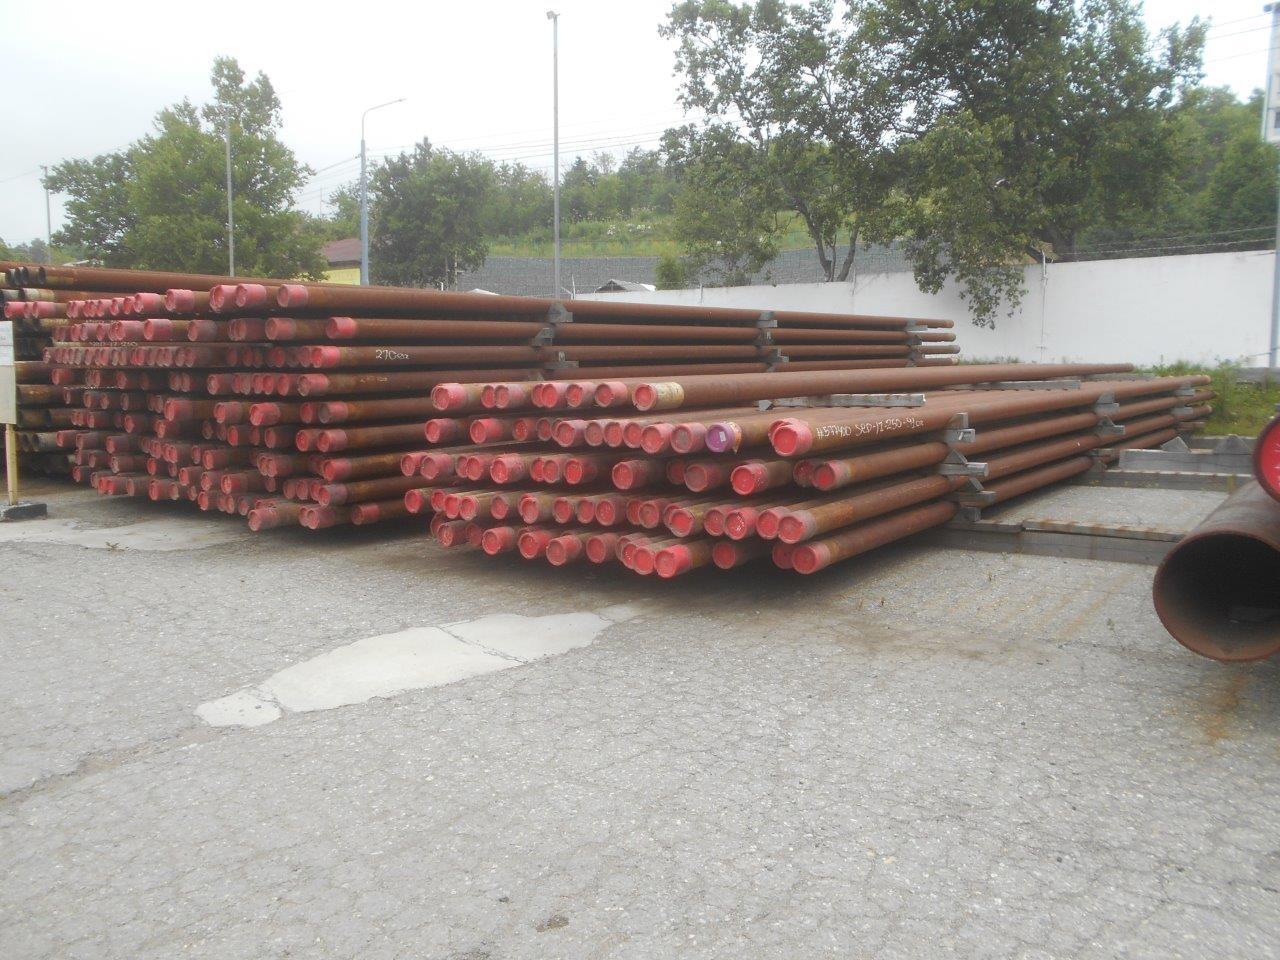 Труба насосно-компрессорная 139,7мм, сталь, б/у, 399шт (17-250-3)